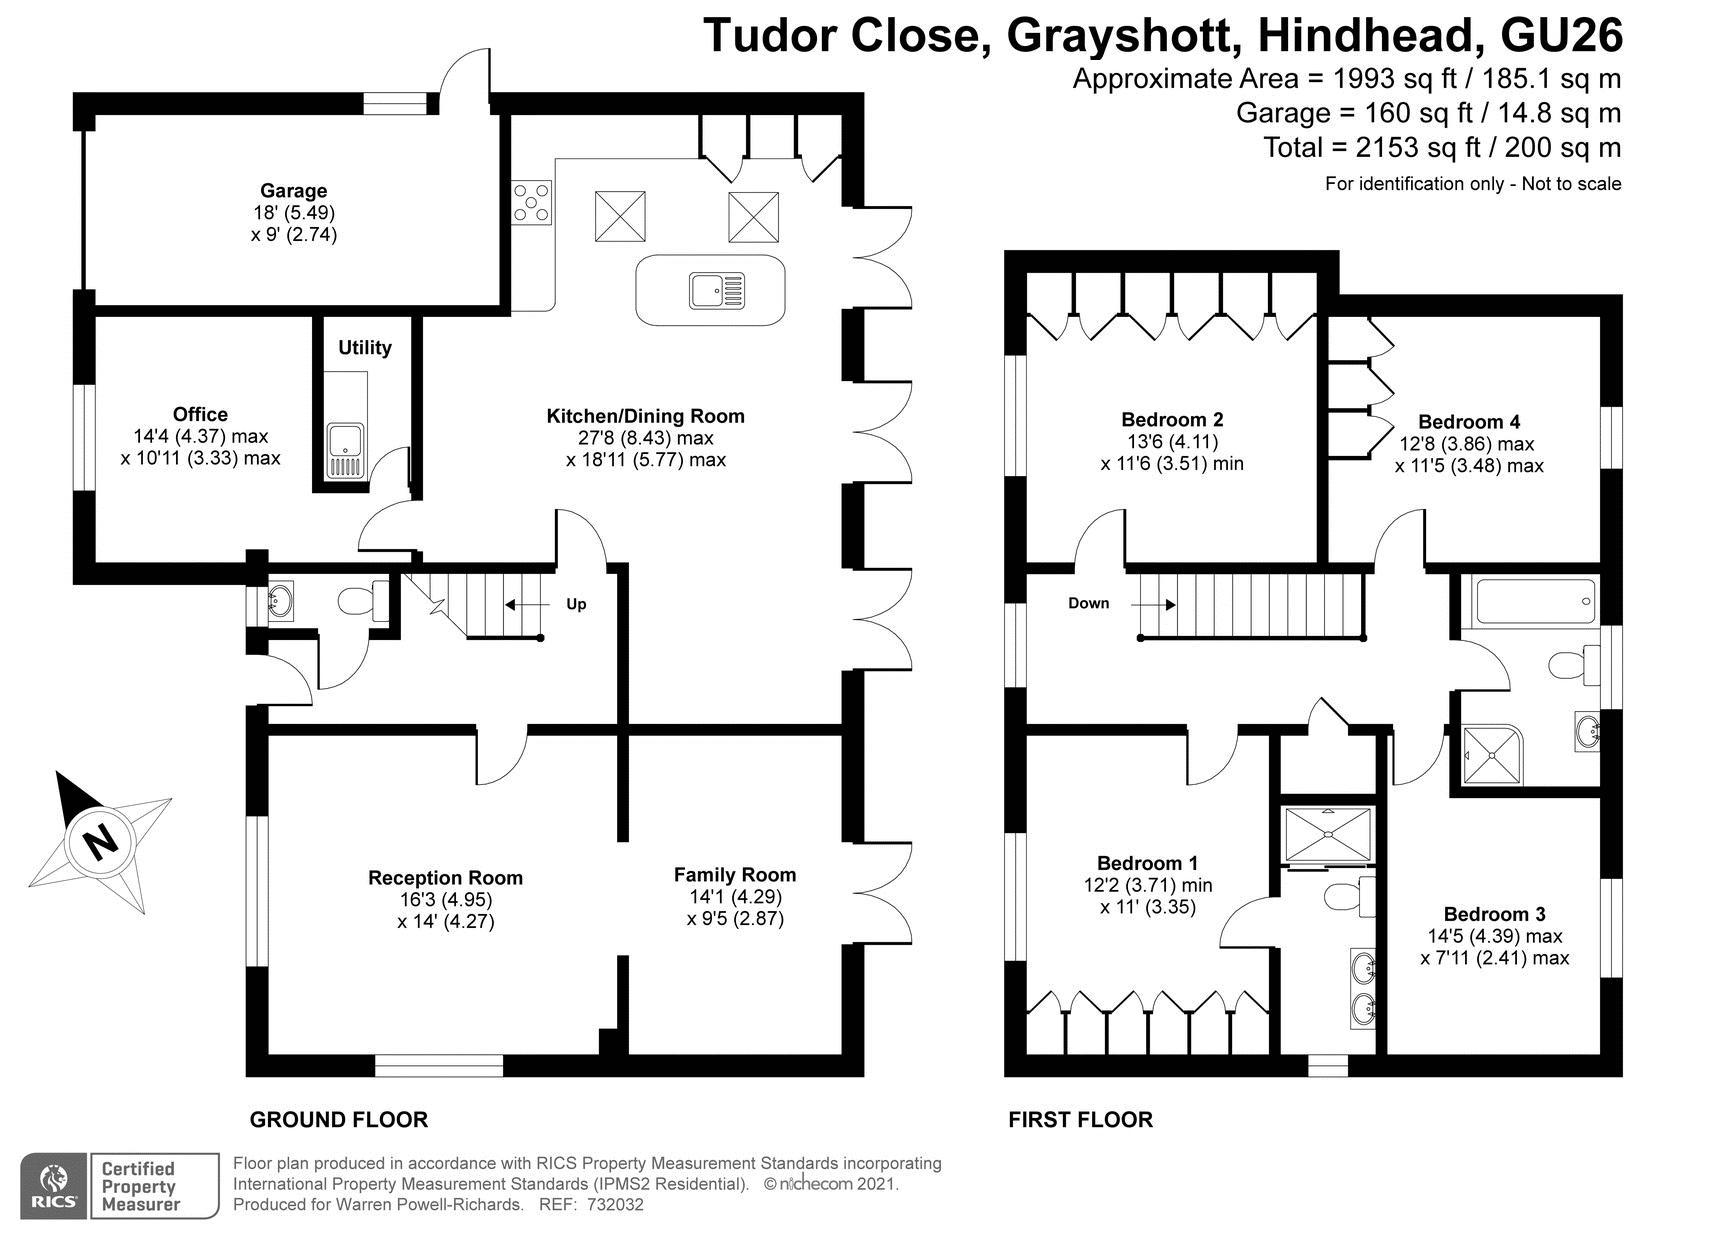 Tudor Close Grayshott